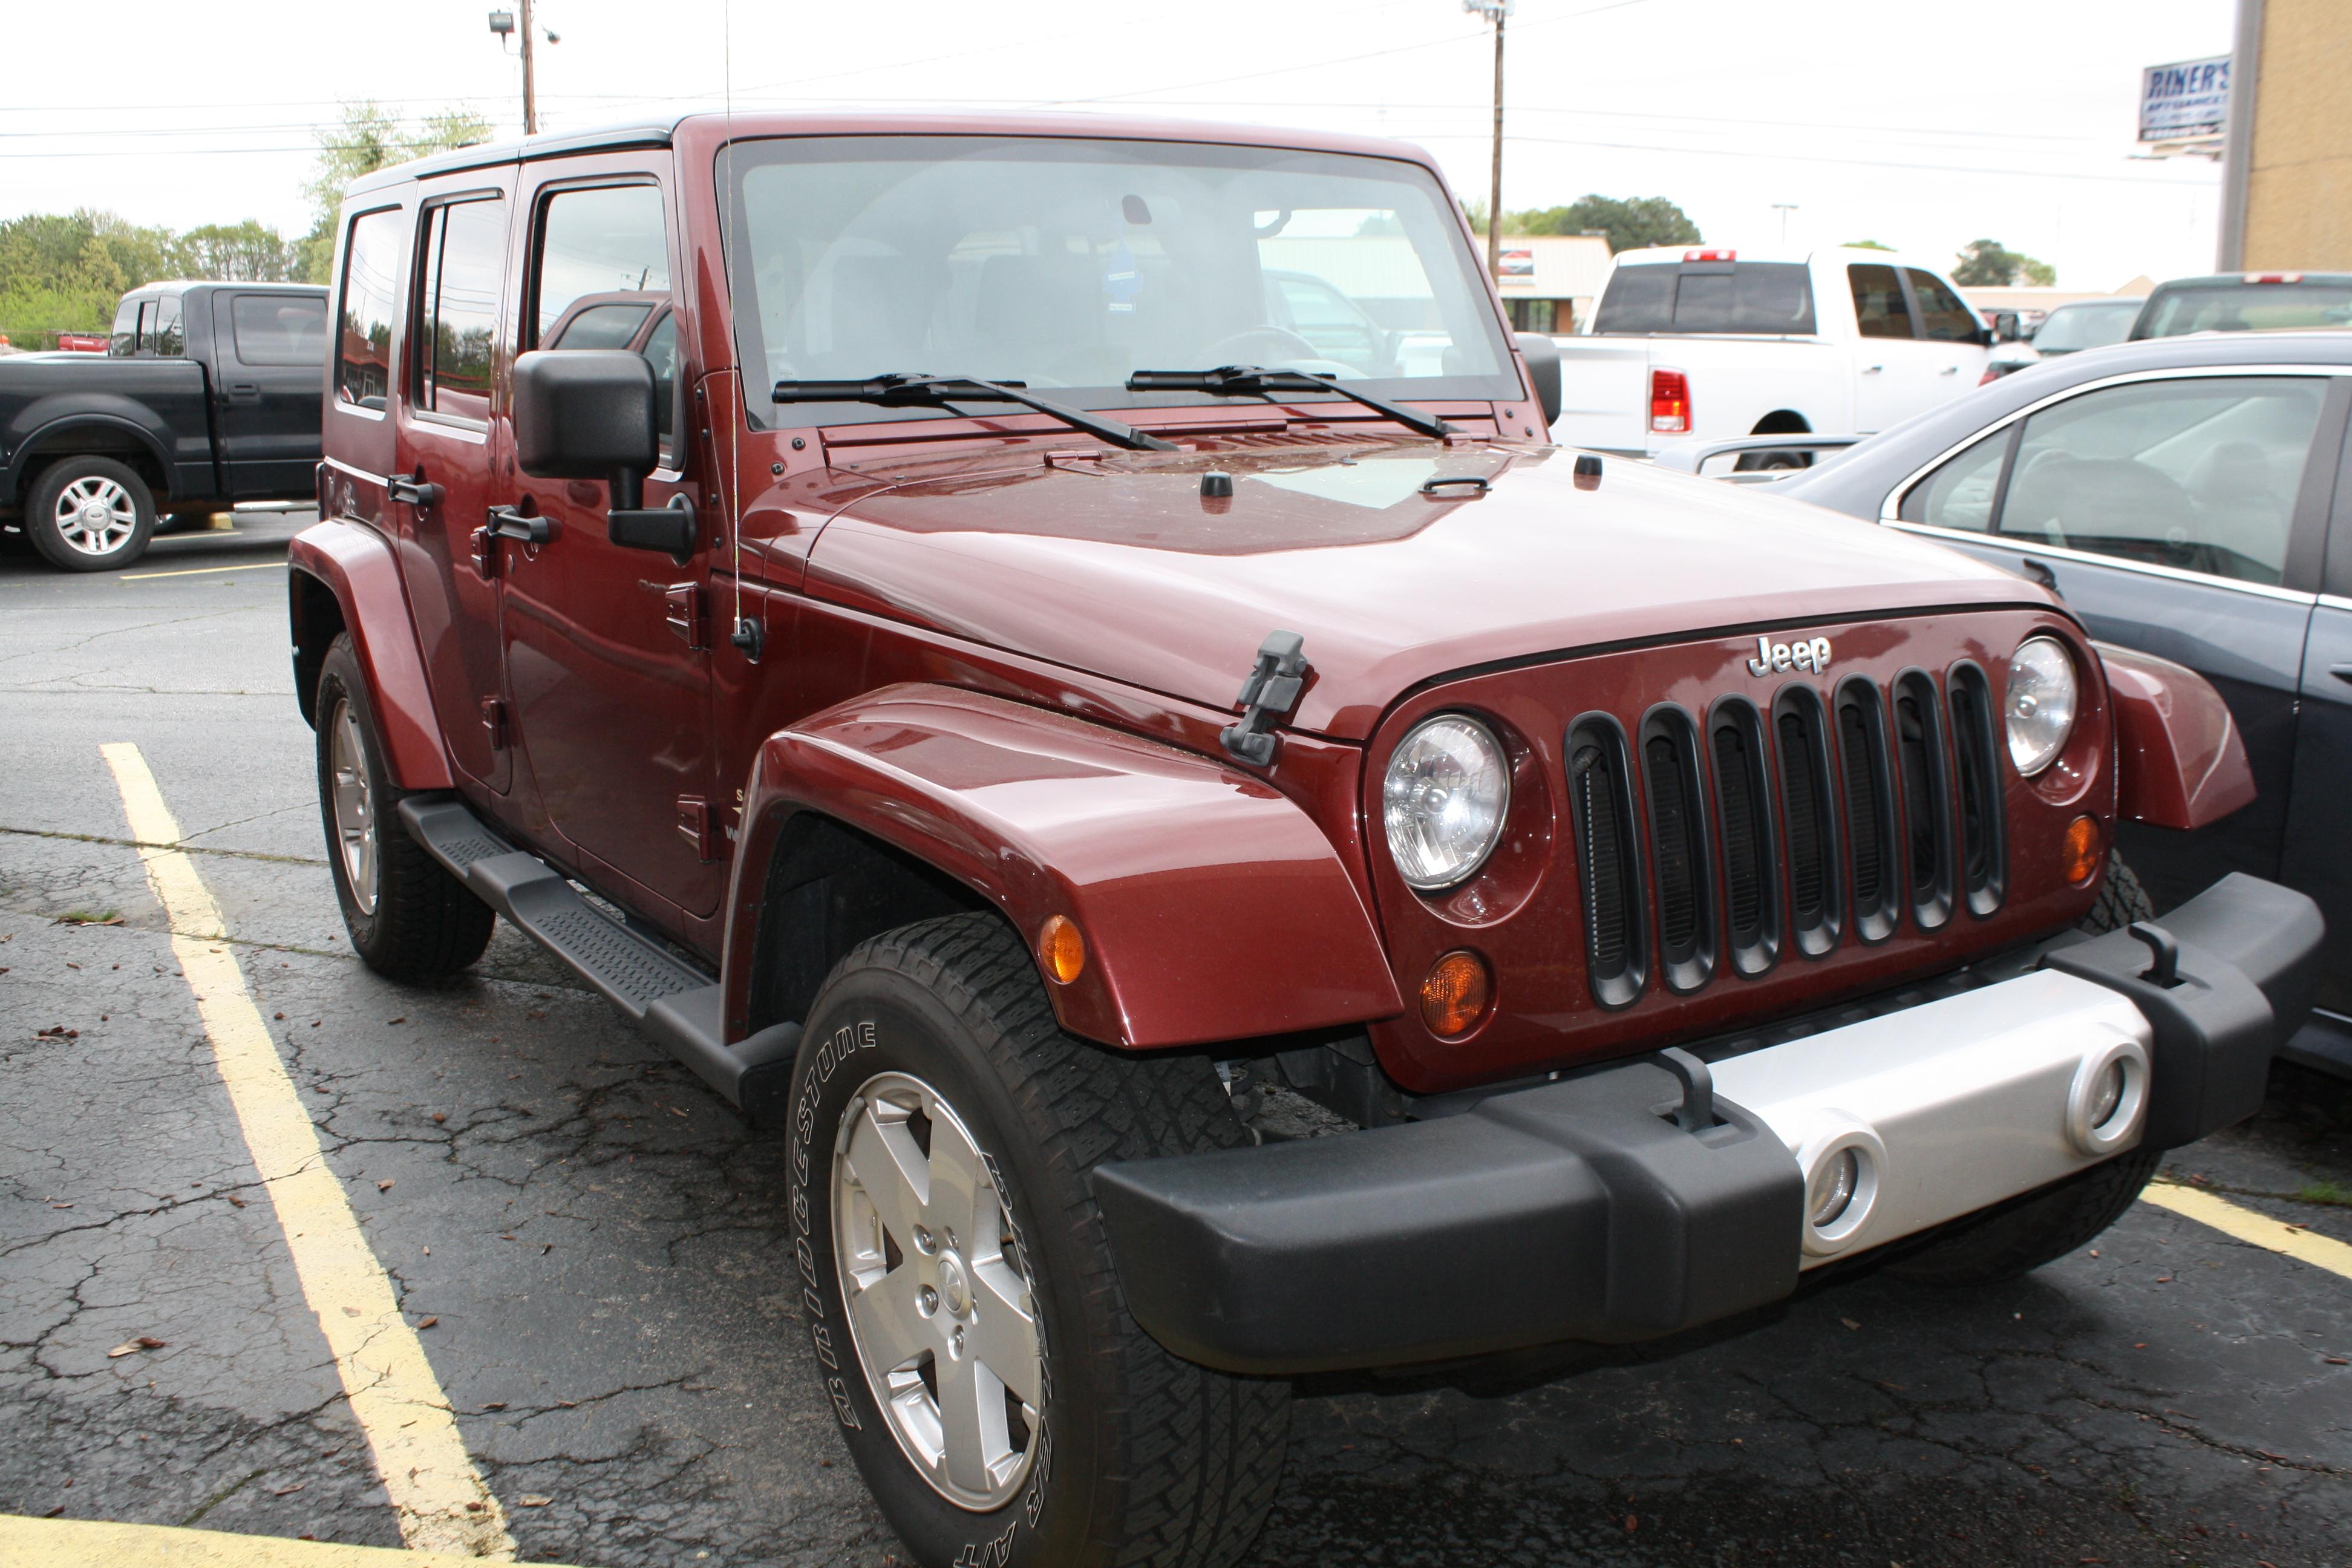 2010 jeep wrangler unlimited sahara 4d utility 4wd diminished value car appraisal. Black Bedroom Furniture Sets. Home Design Ideas